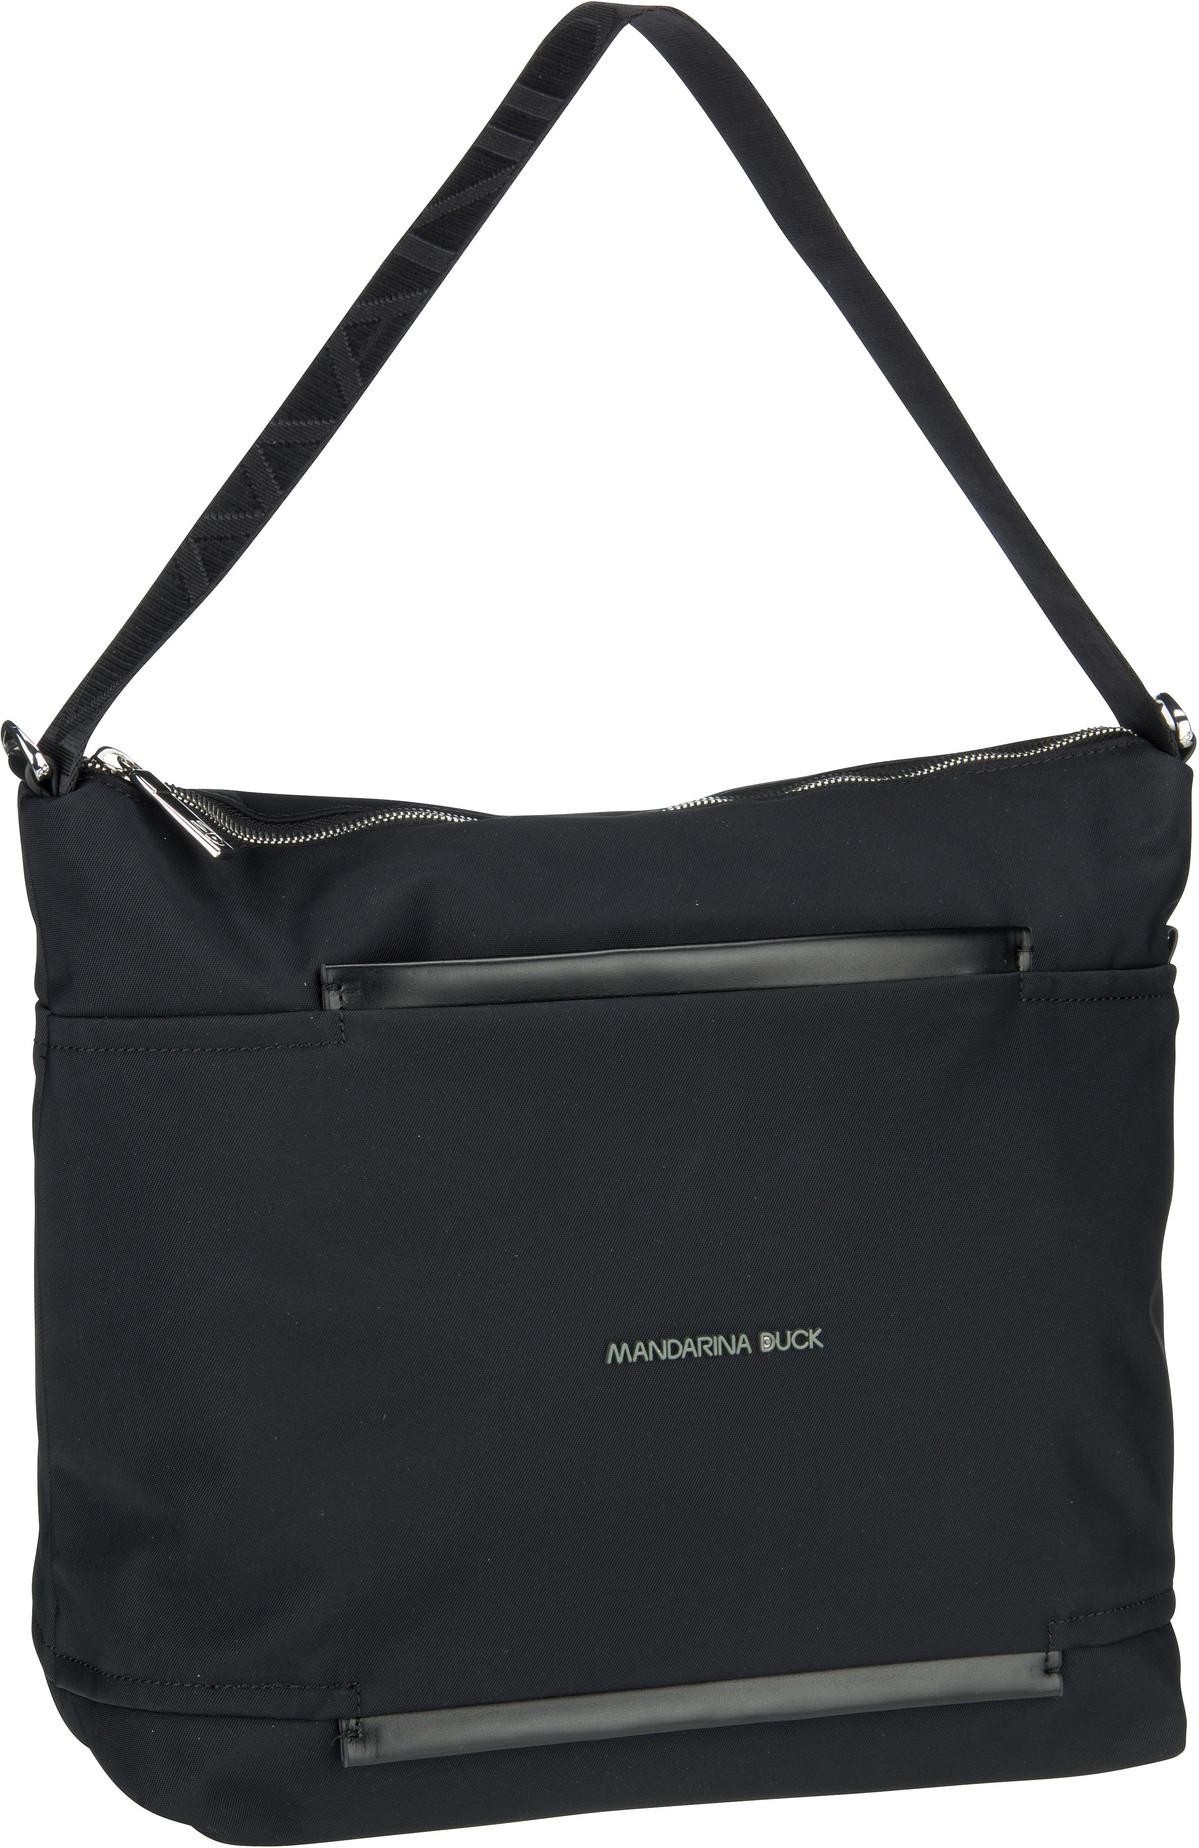 Handtasche Daphne Hobo PDT08 Black